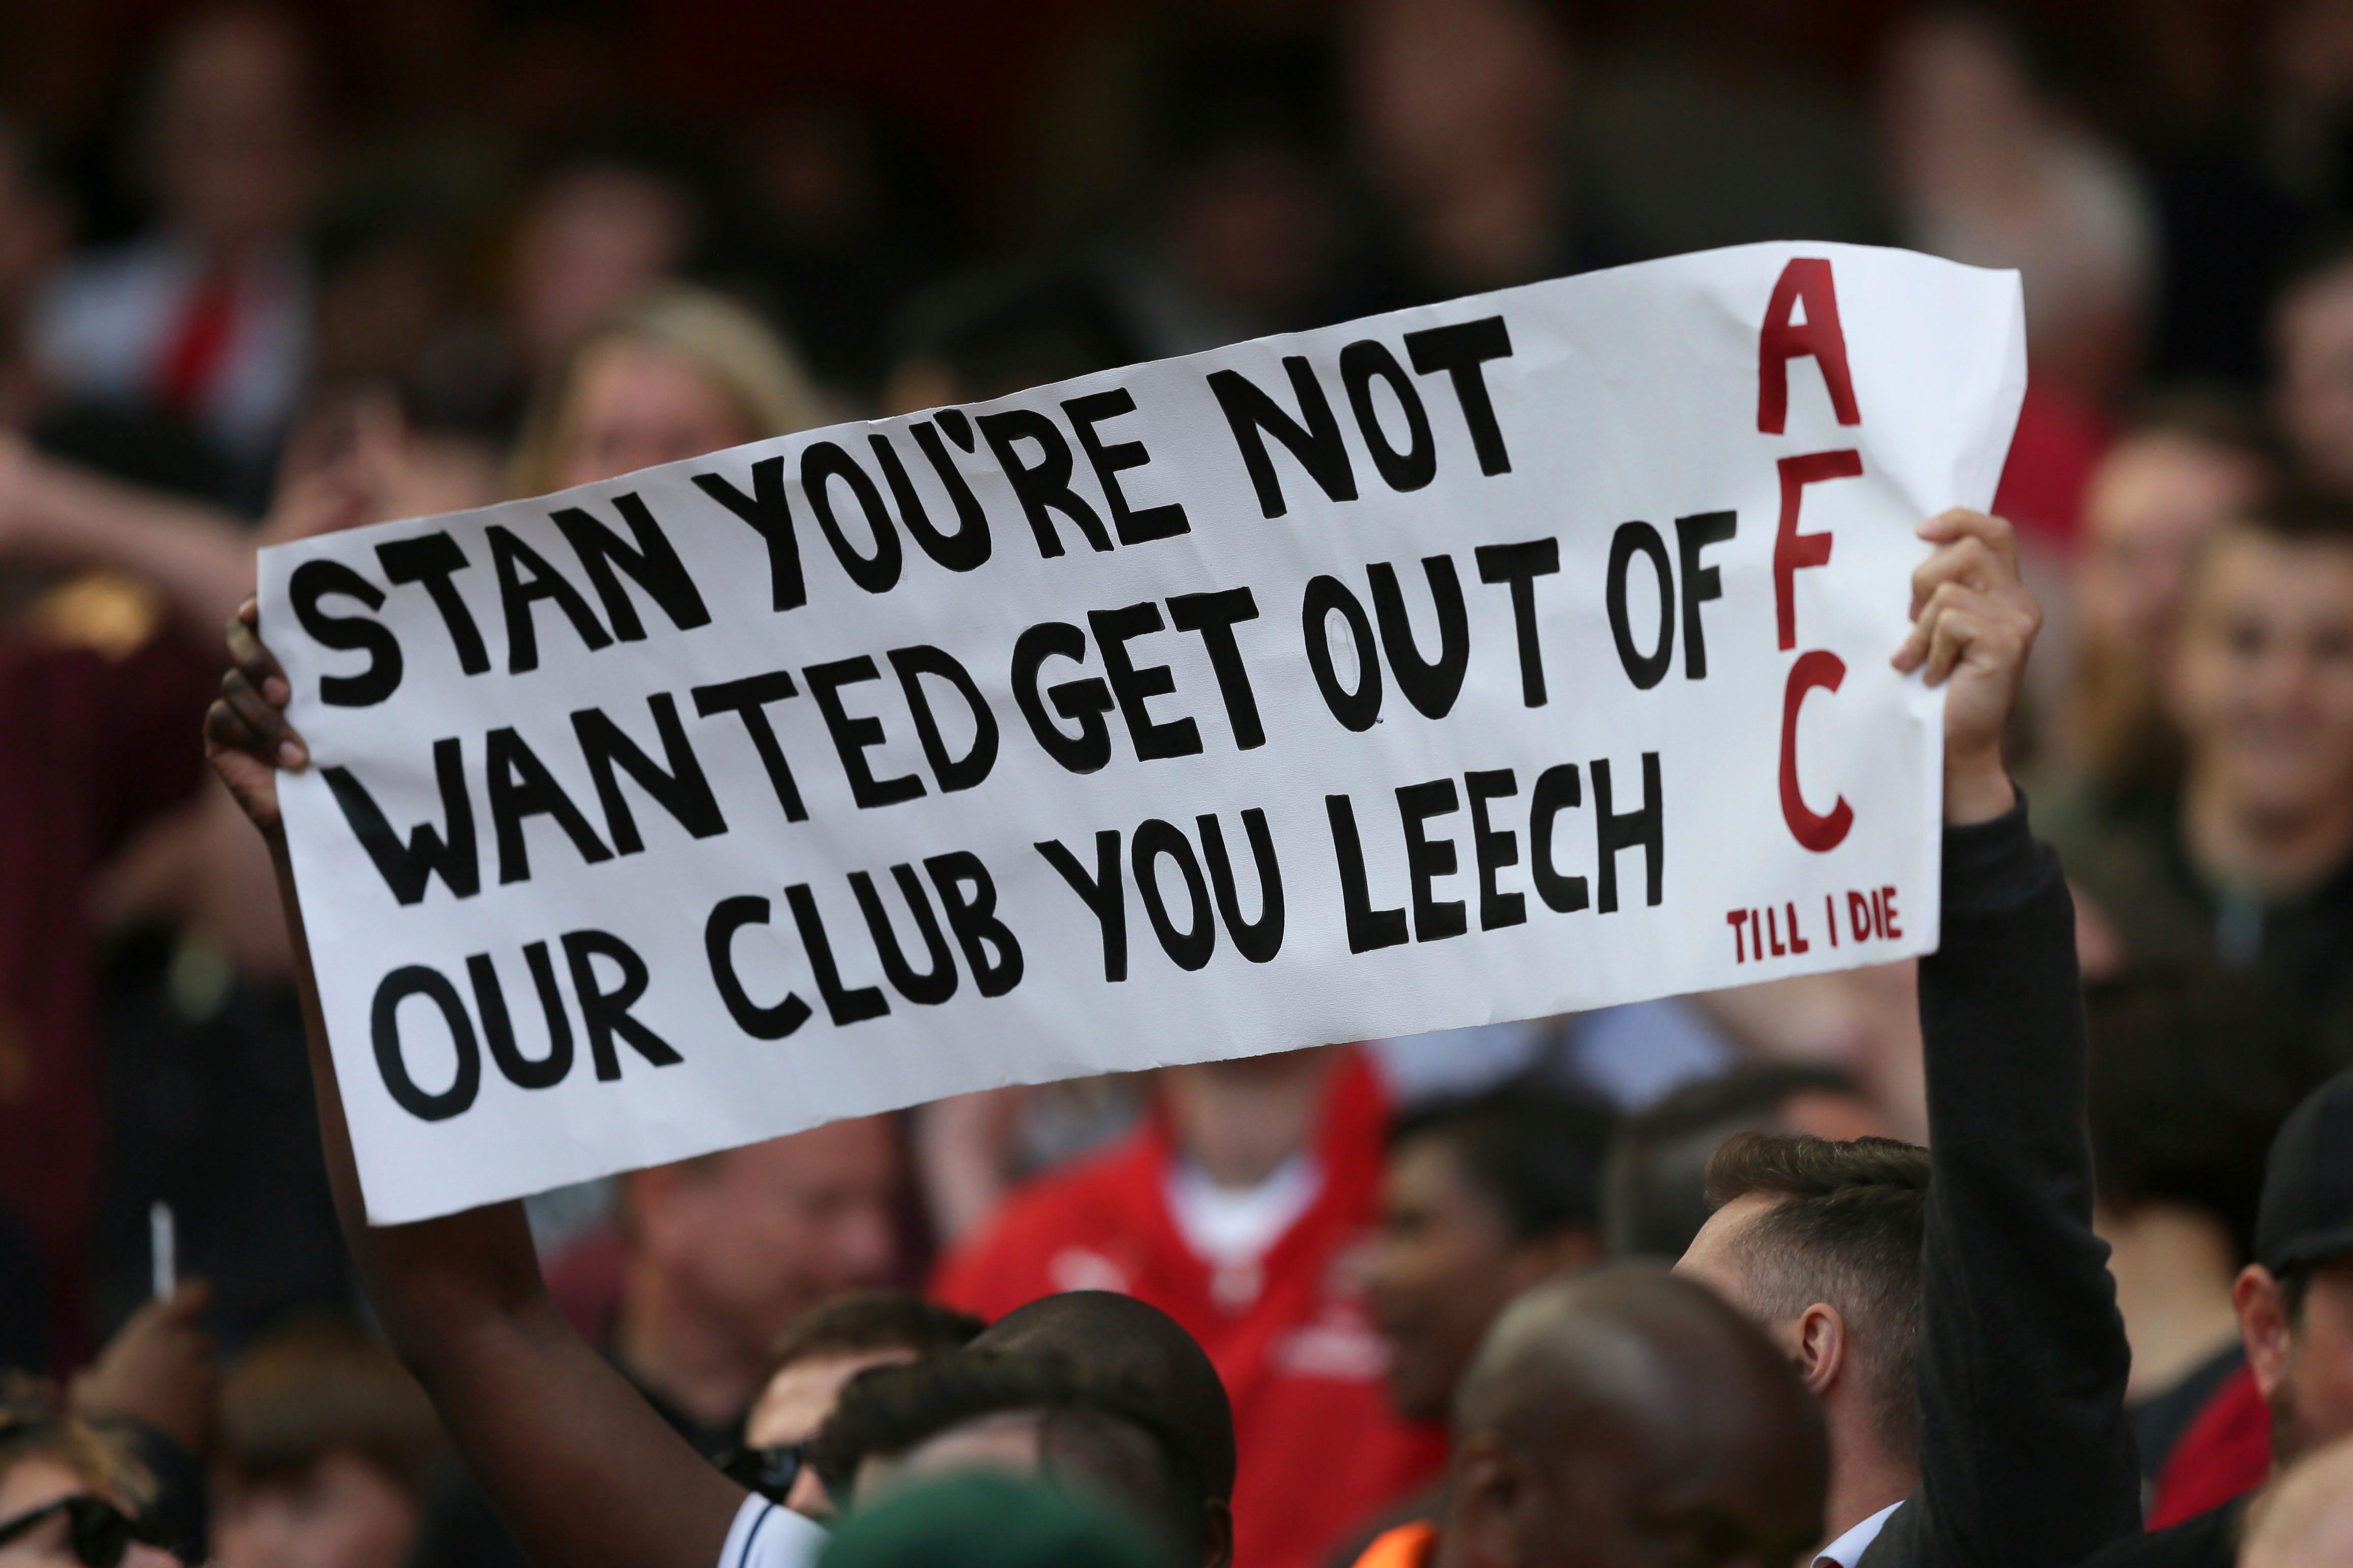 Arsenal owner Stan Kroenke says Gunners not for sale after hefty bid